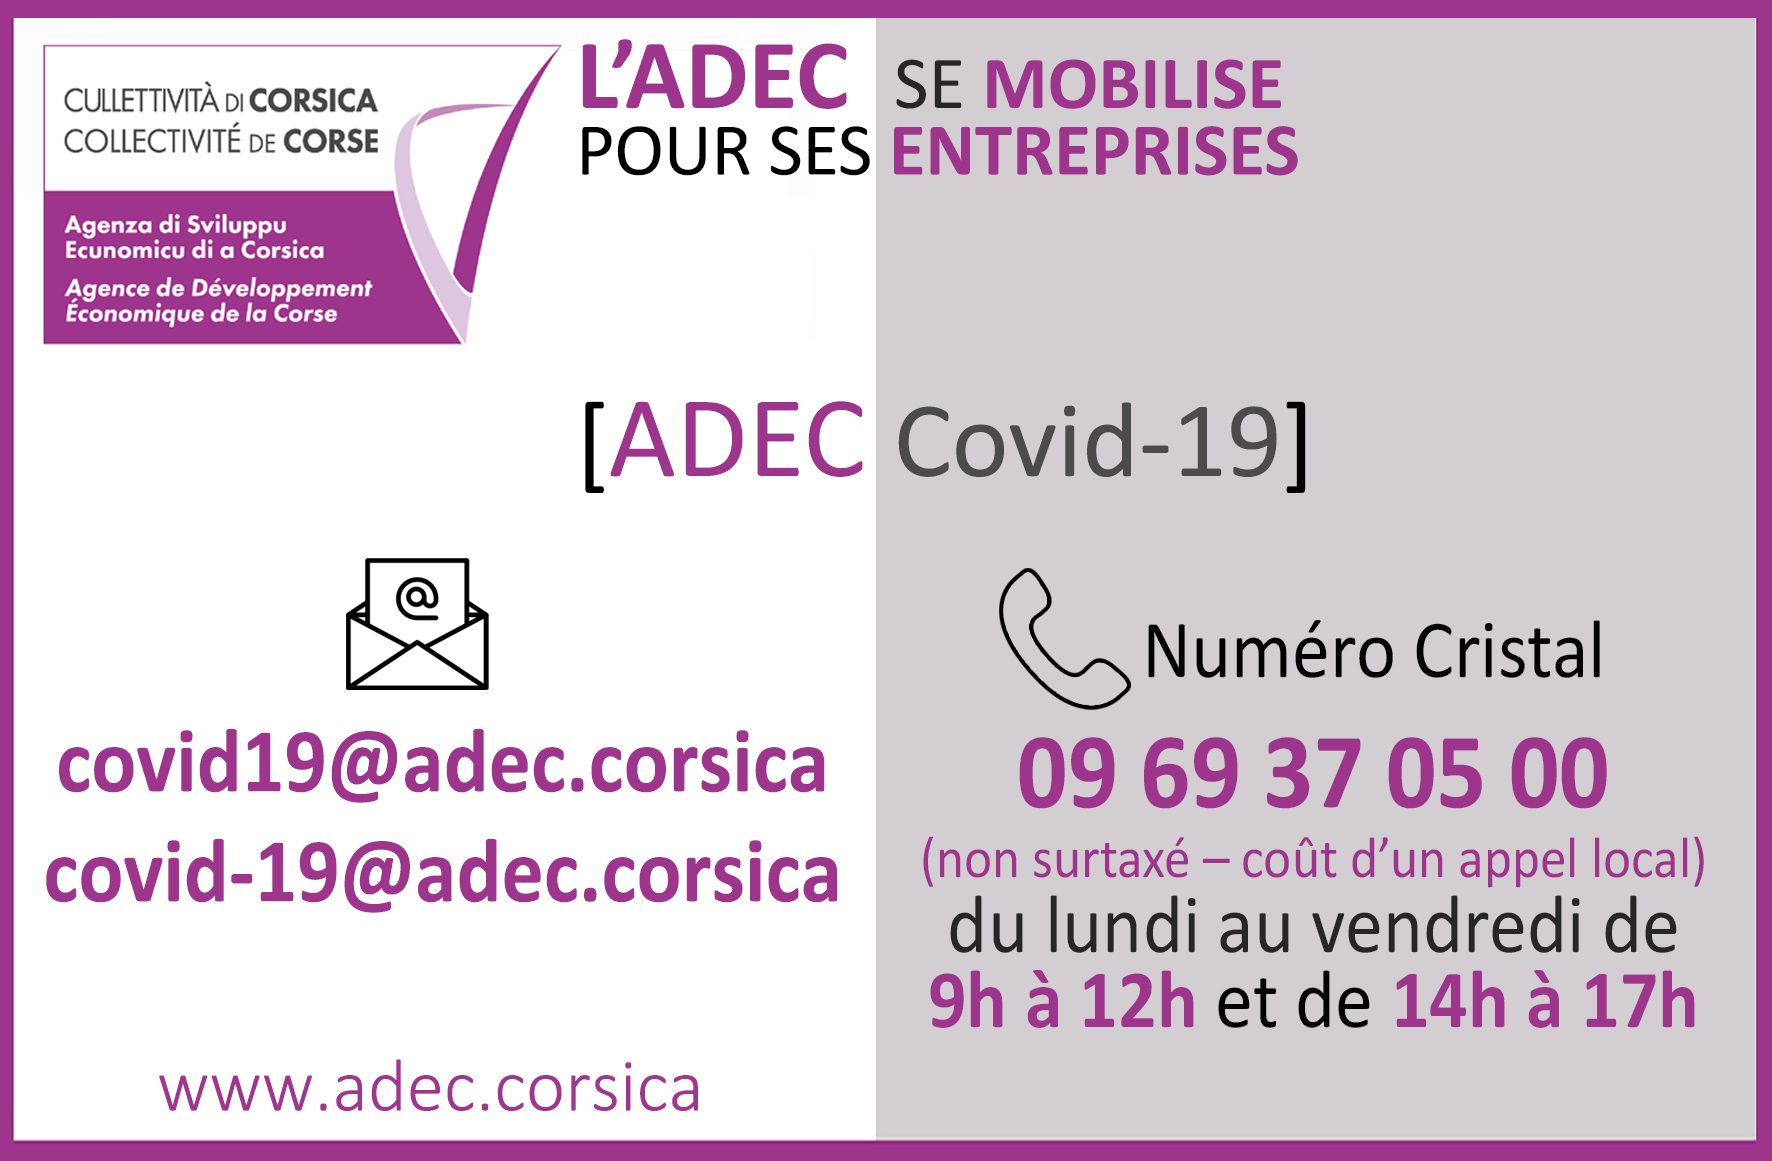 [Covid-19]📞0969370500 📧covid19@adec.corsica / covid-19@adec.corsica